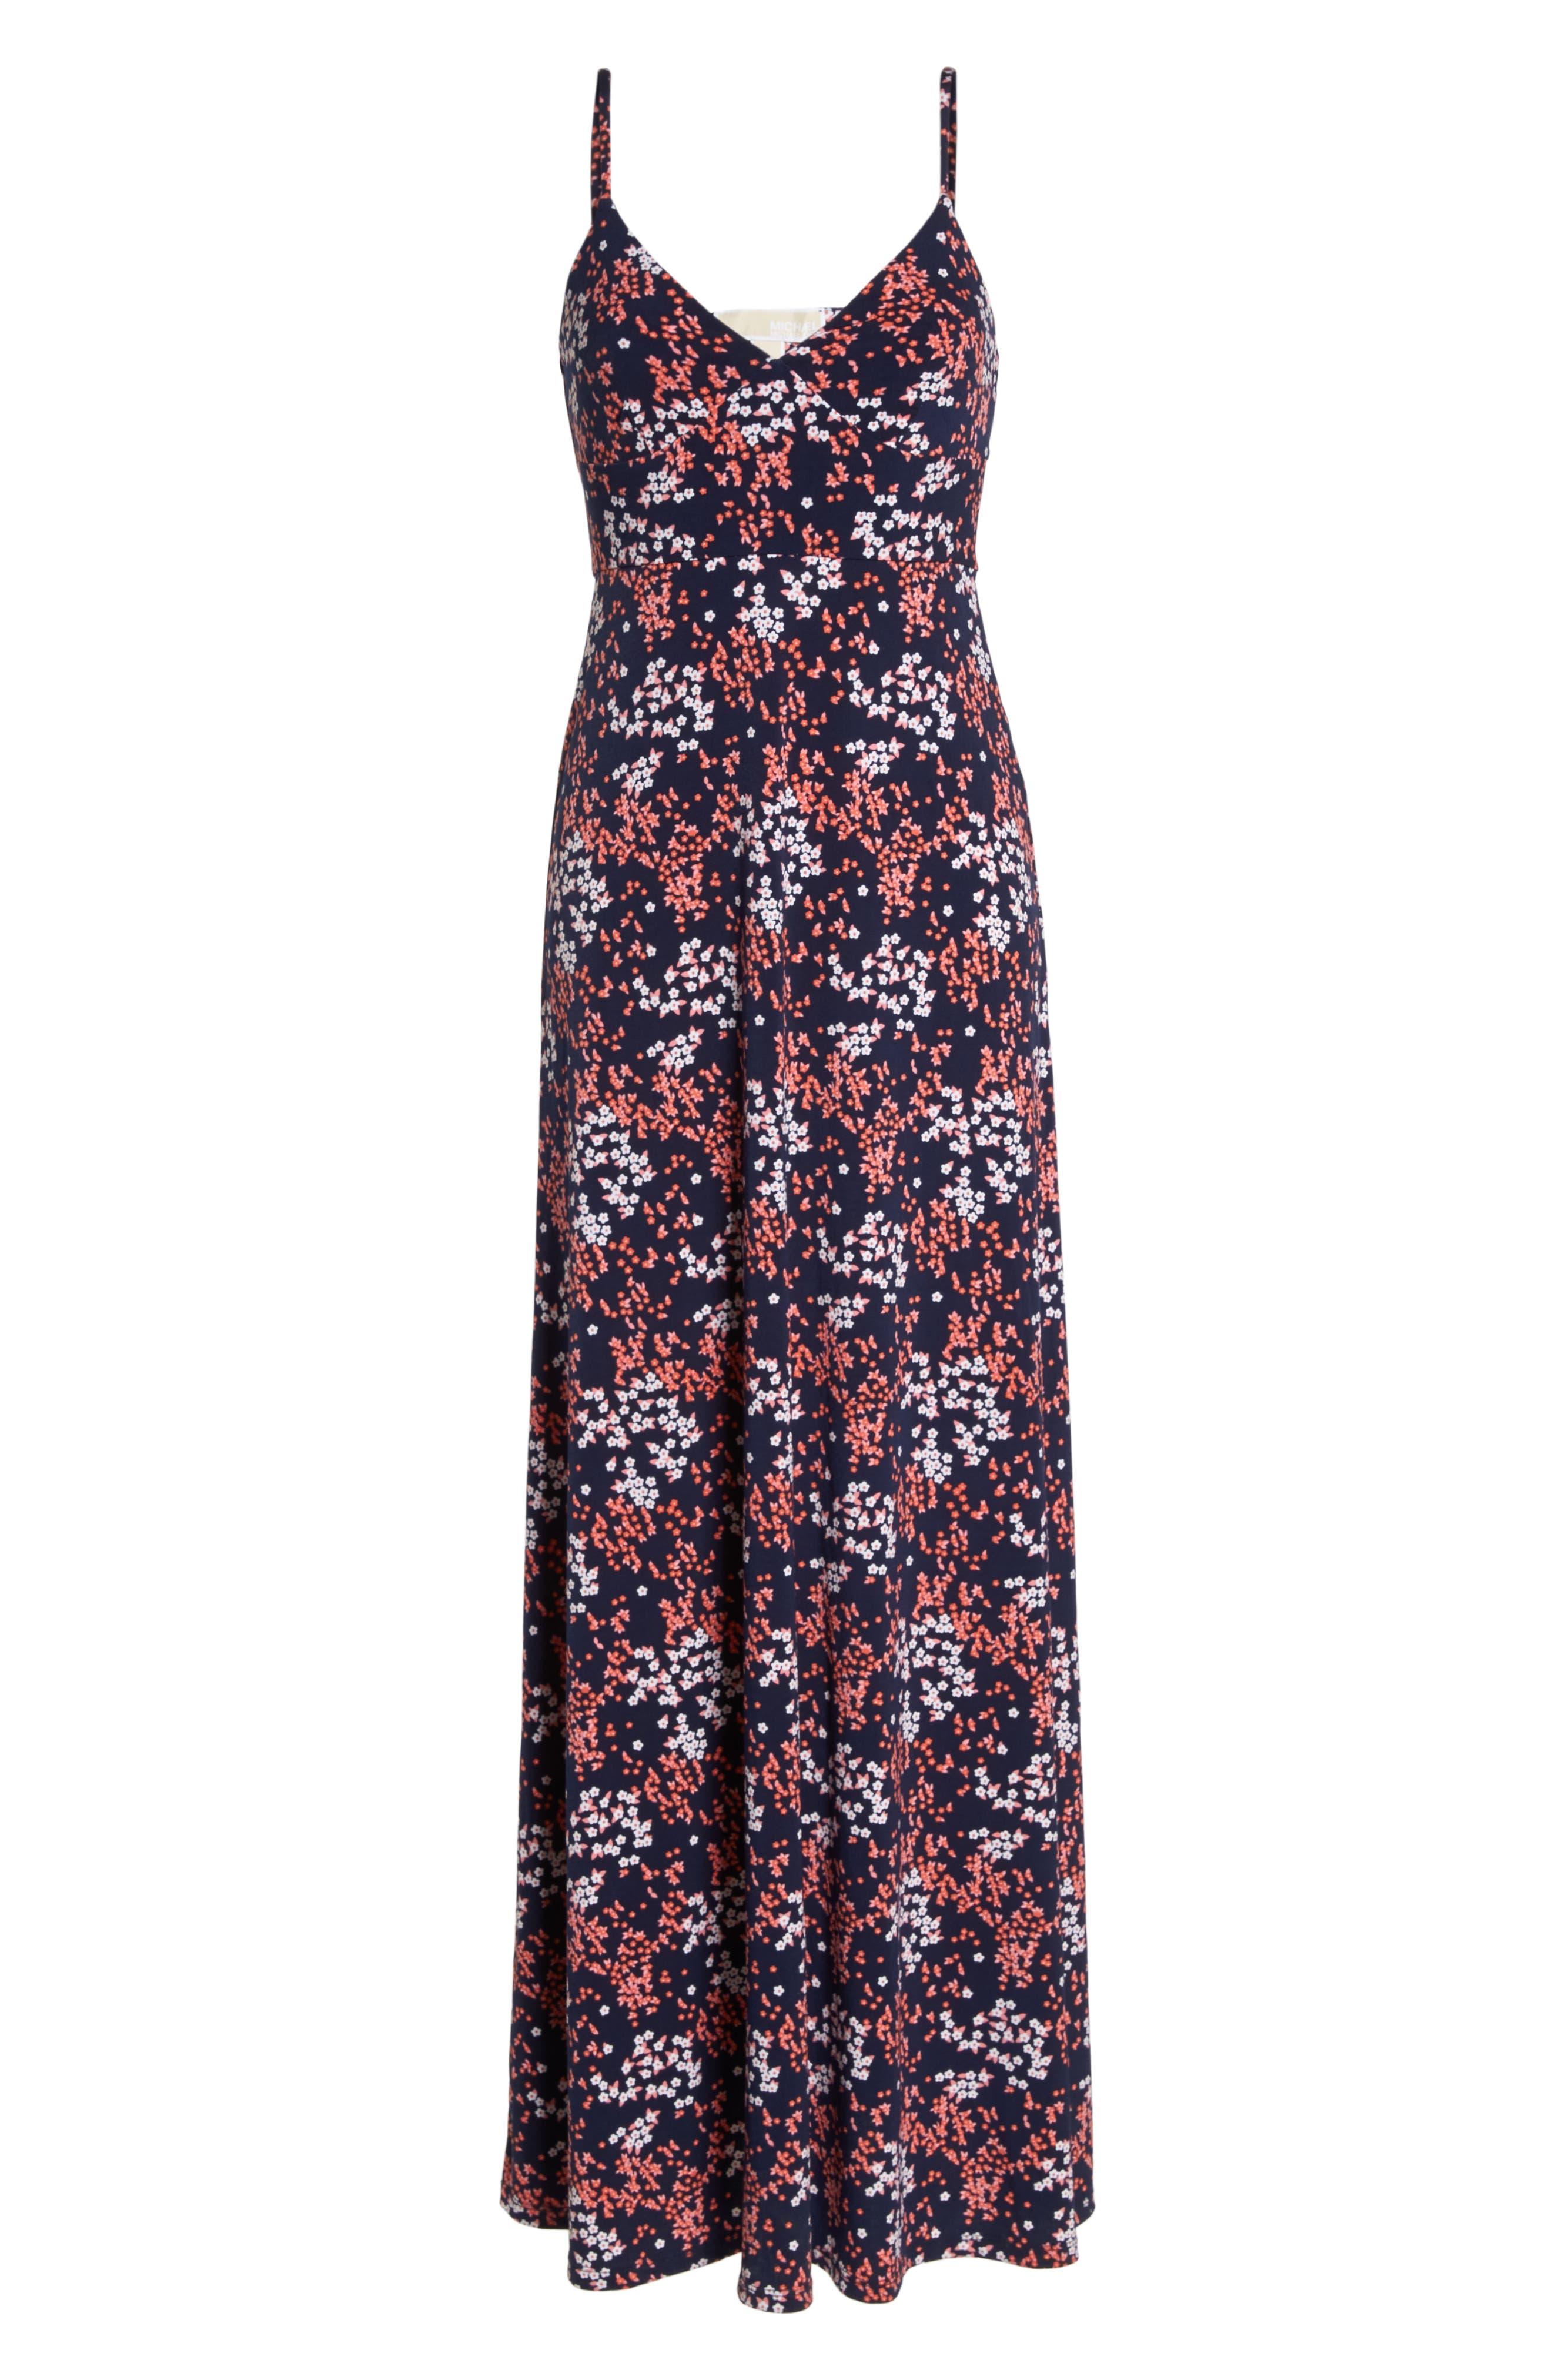 Bloom Maxi Dress,                             Alternate thumbnail 7, color,                             True Navy/ Bight Blush